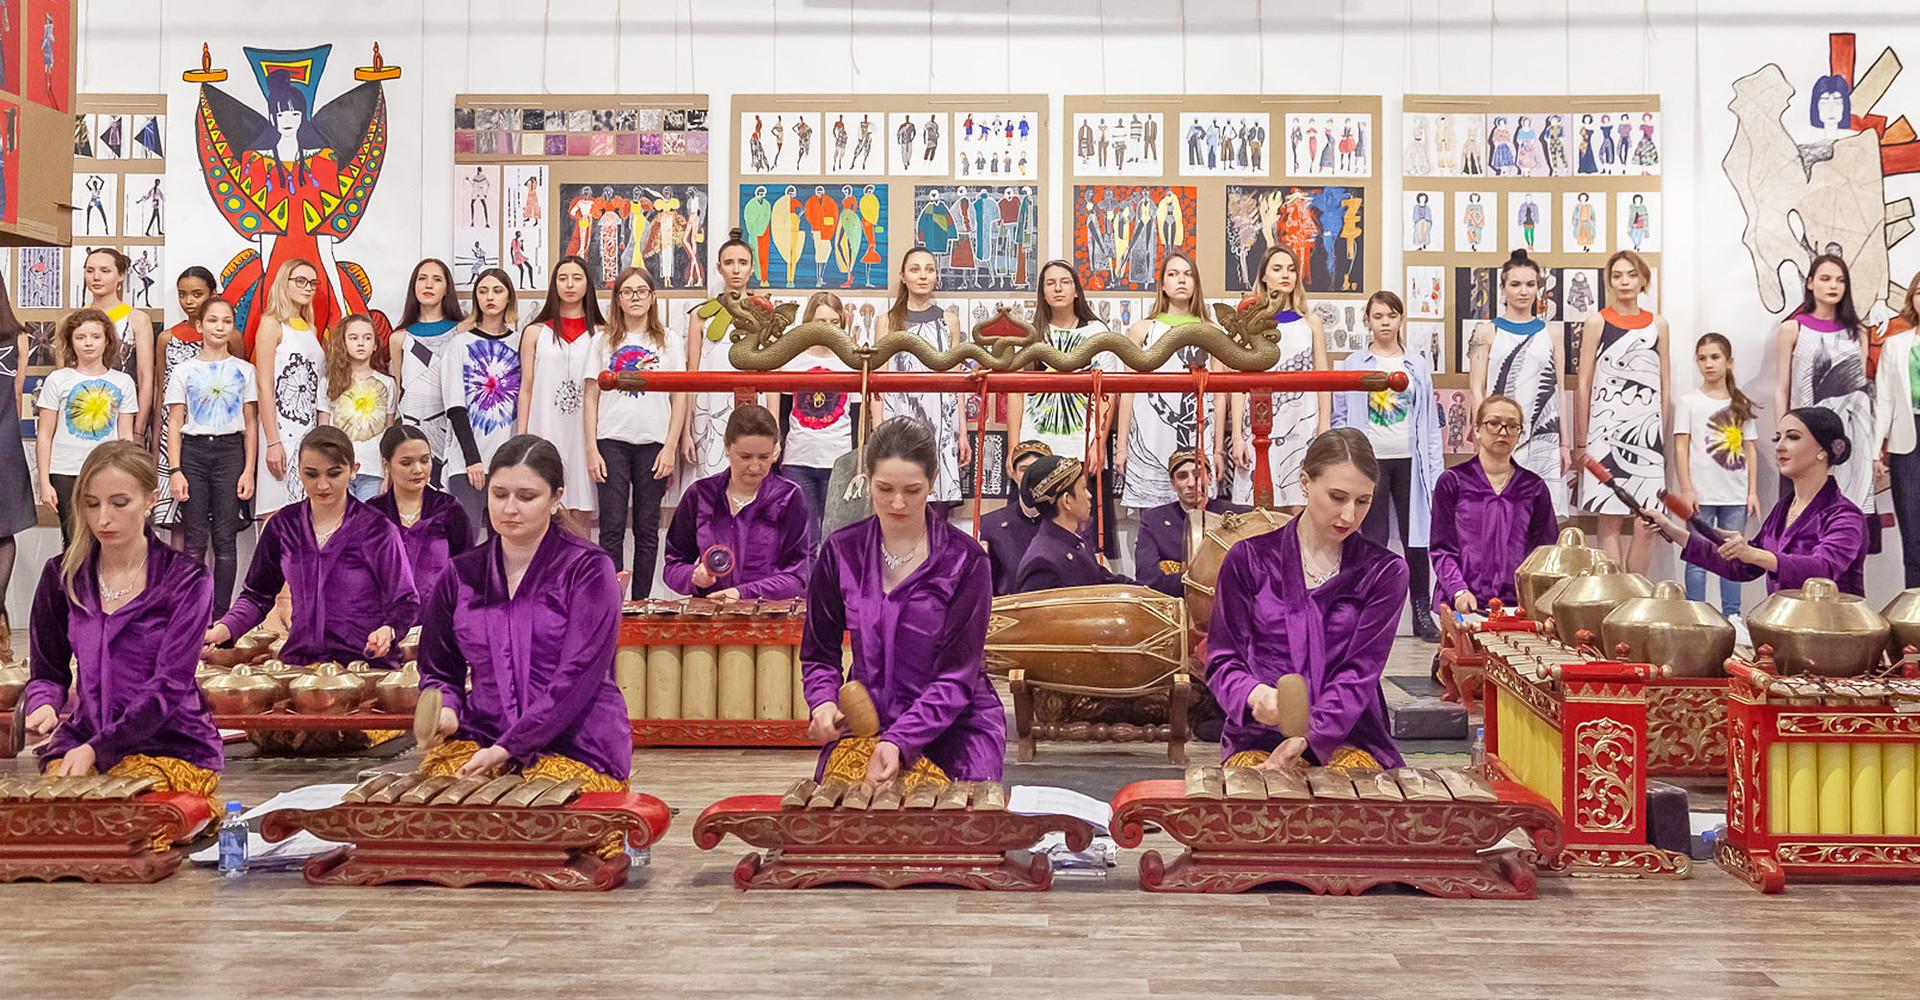 Grup musik Gamelan Dadali mengiringi jalannya peragaan busana.